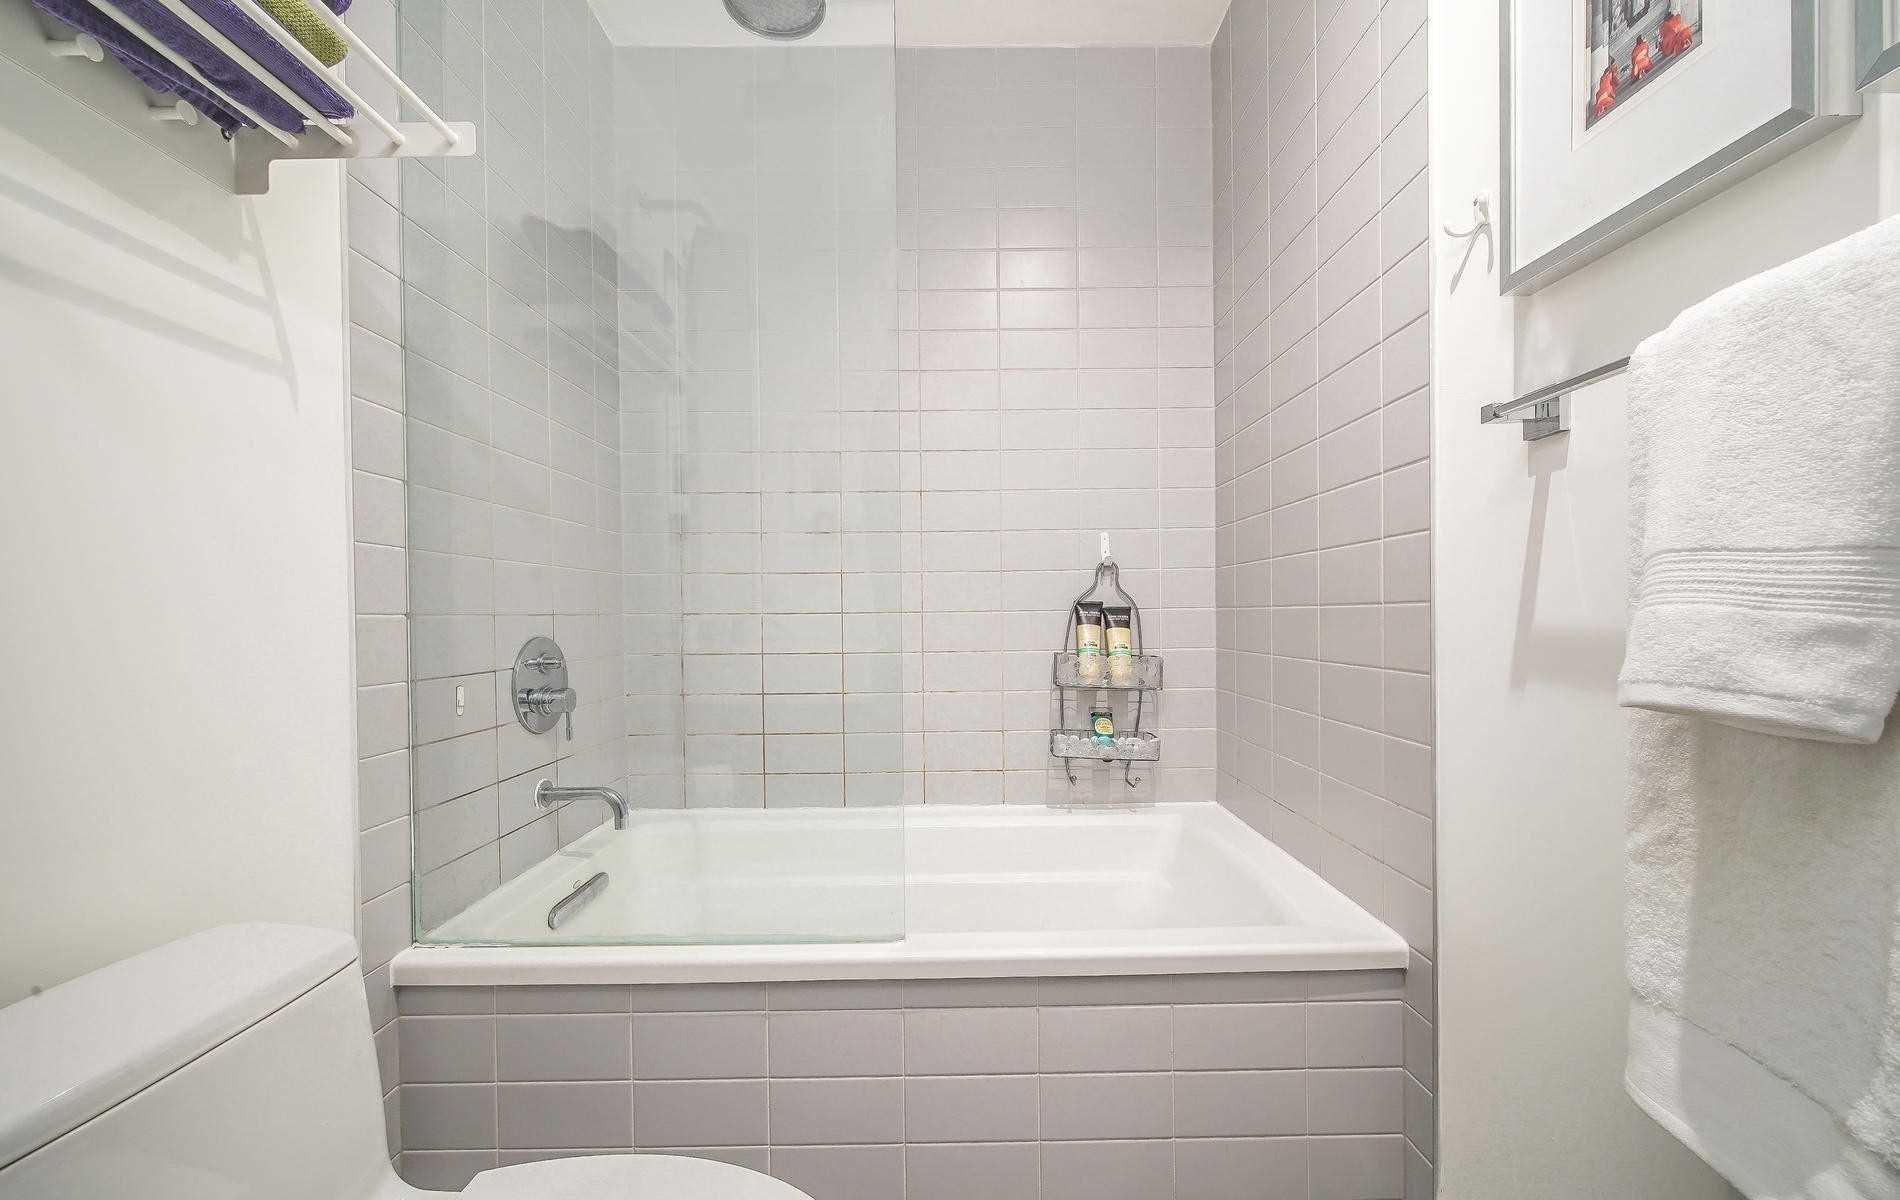 Photo 16: Photos: 408 90 Broadview Avenue in Toronto: South Riverdale Condo for sale (Toronto E01)  : MLS®# E4482454